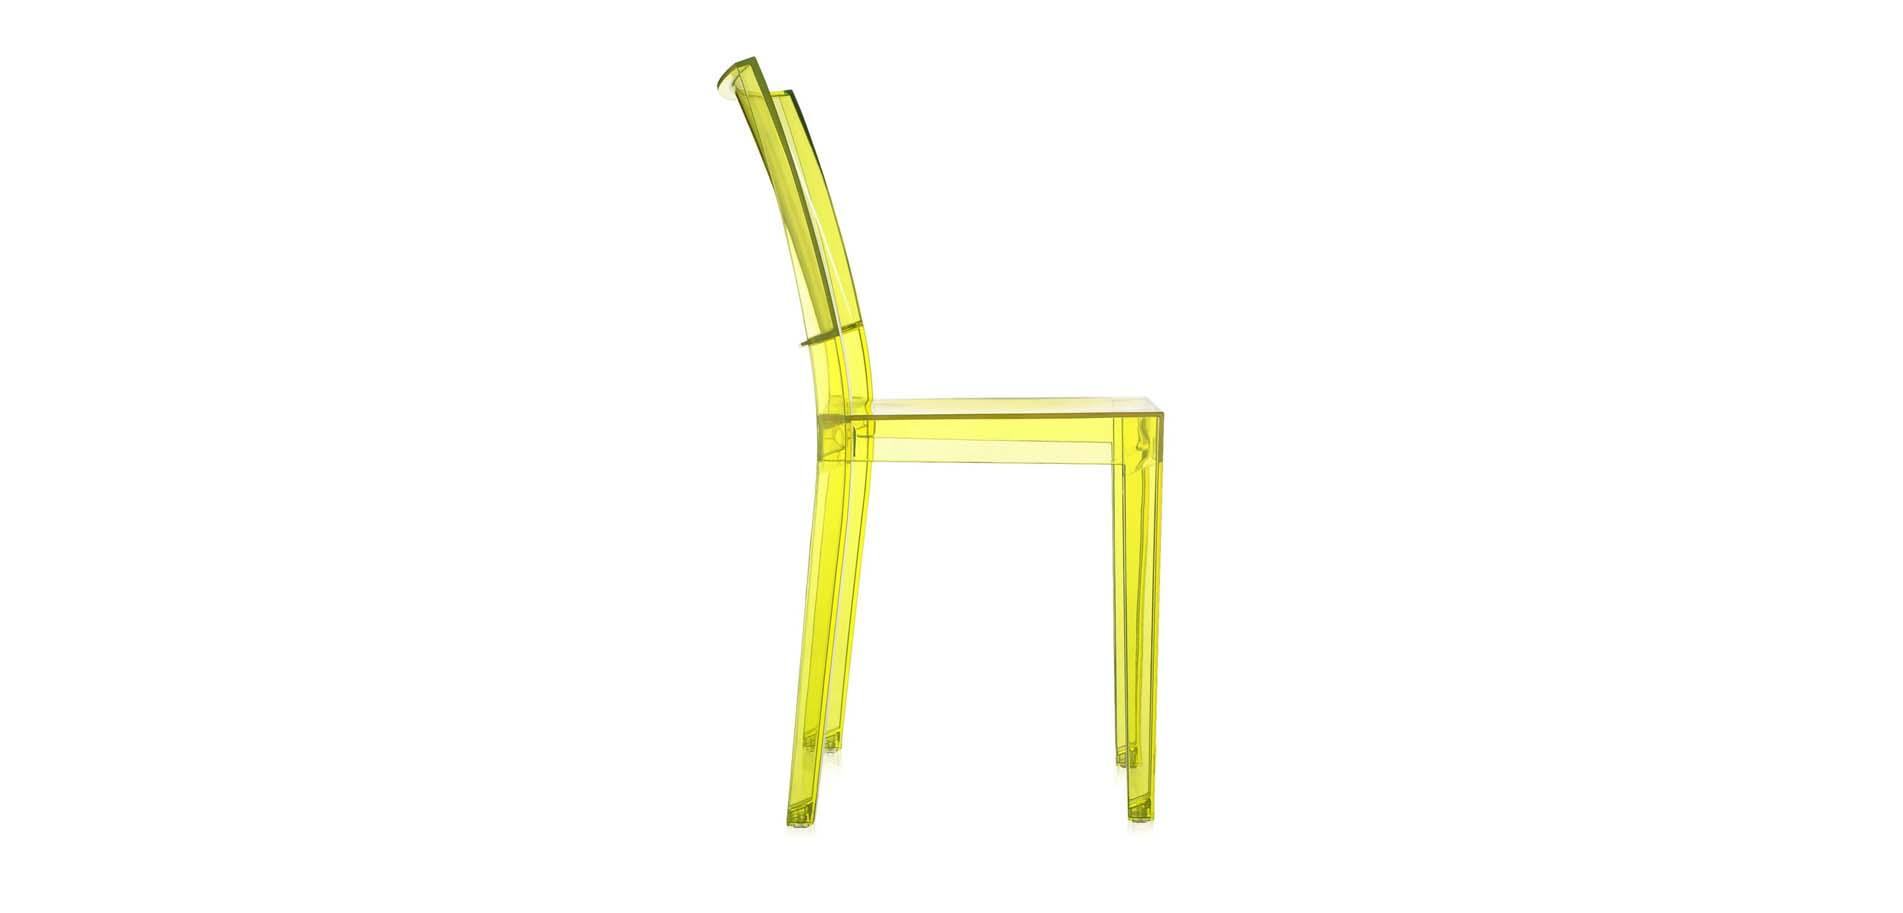 https://www.michalopoulos.com.gr/wp-content/uploads/2017/12/la-marie-karekla-monterna-epipla-kartell-design-karekles-kartell-3488.jpg